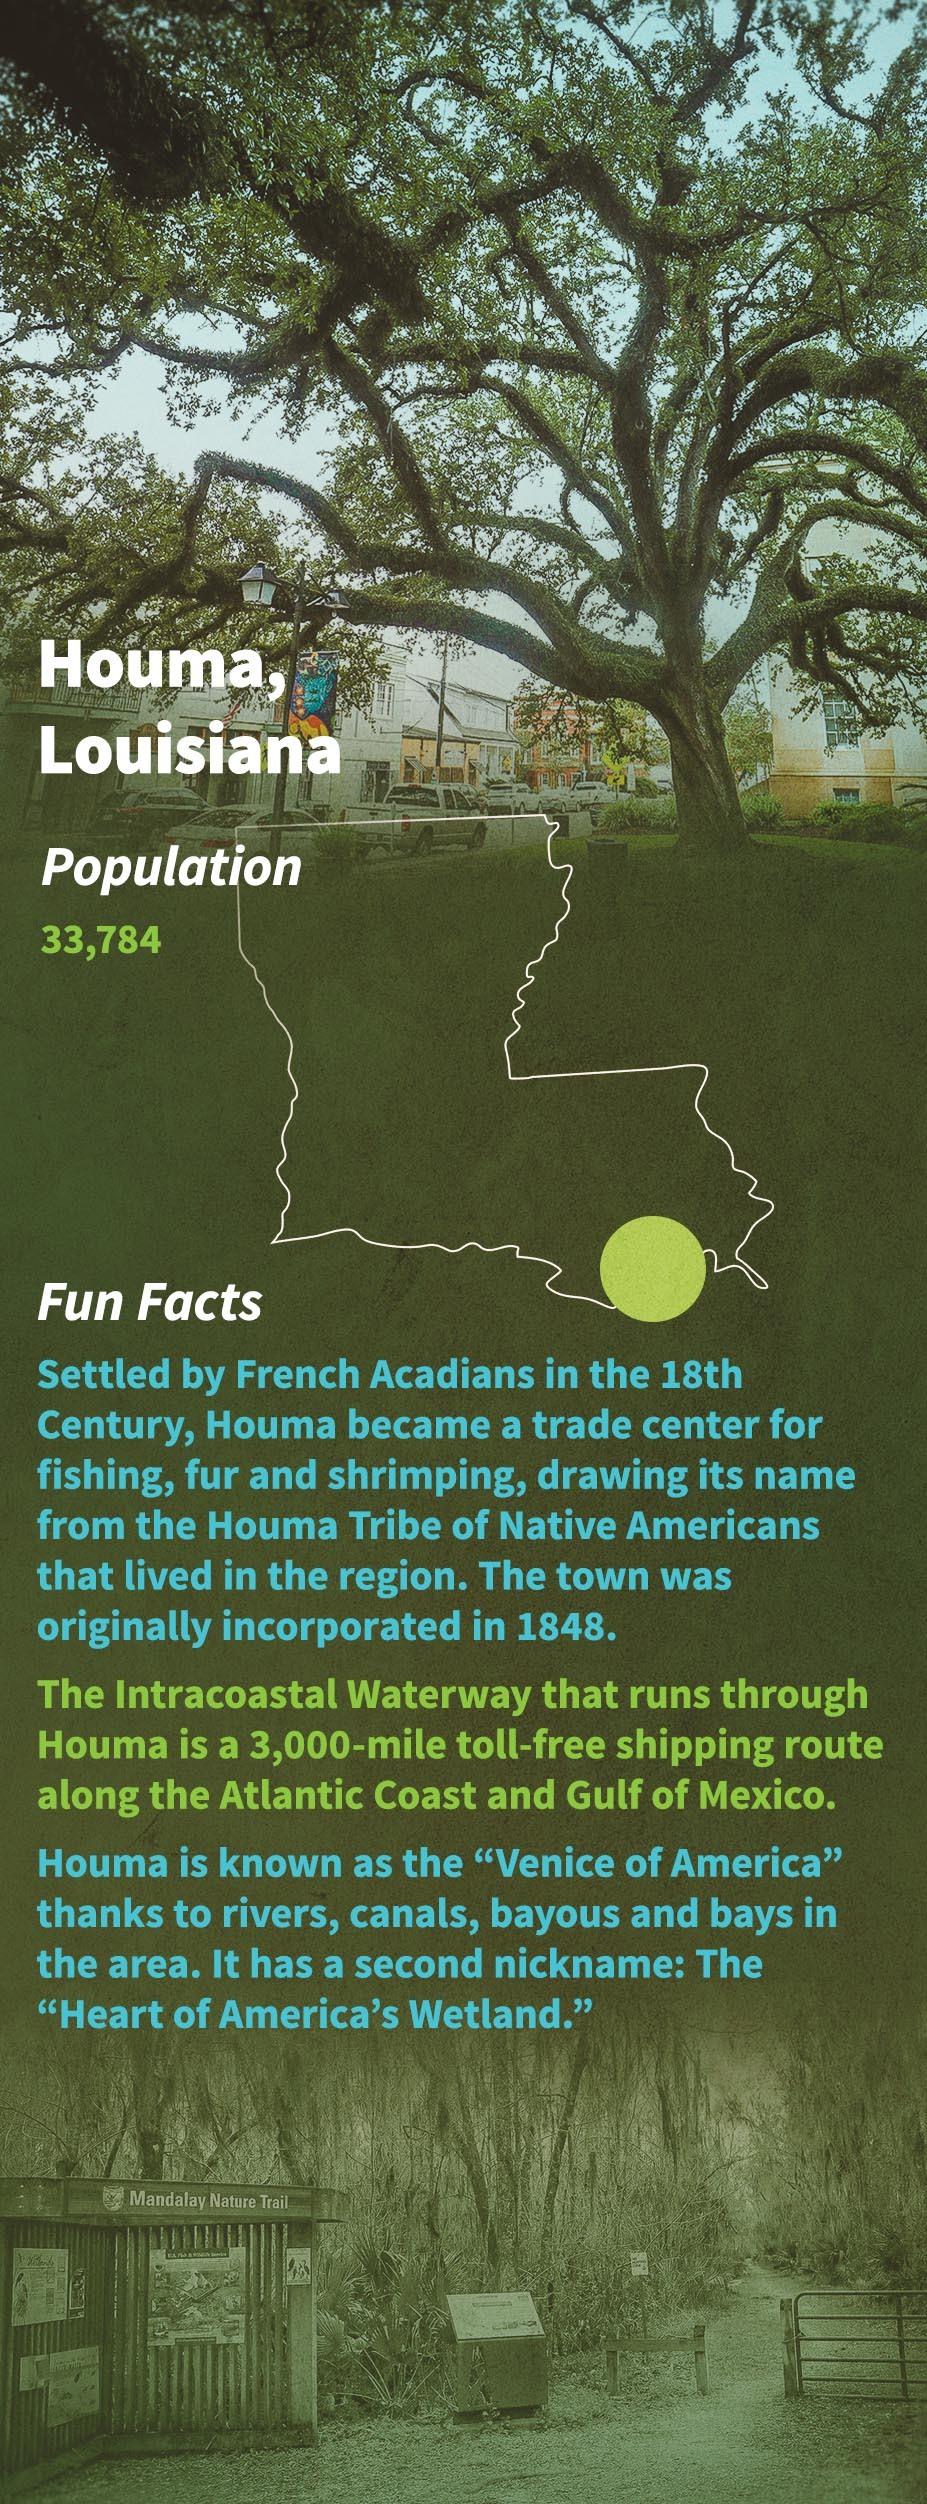 Houma Fun Facts